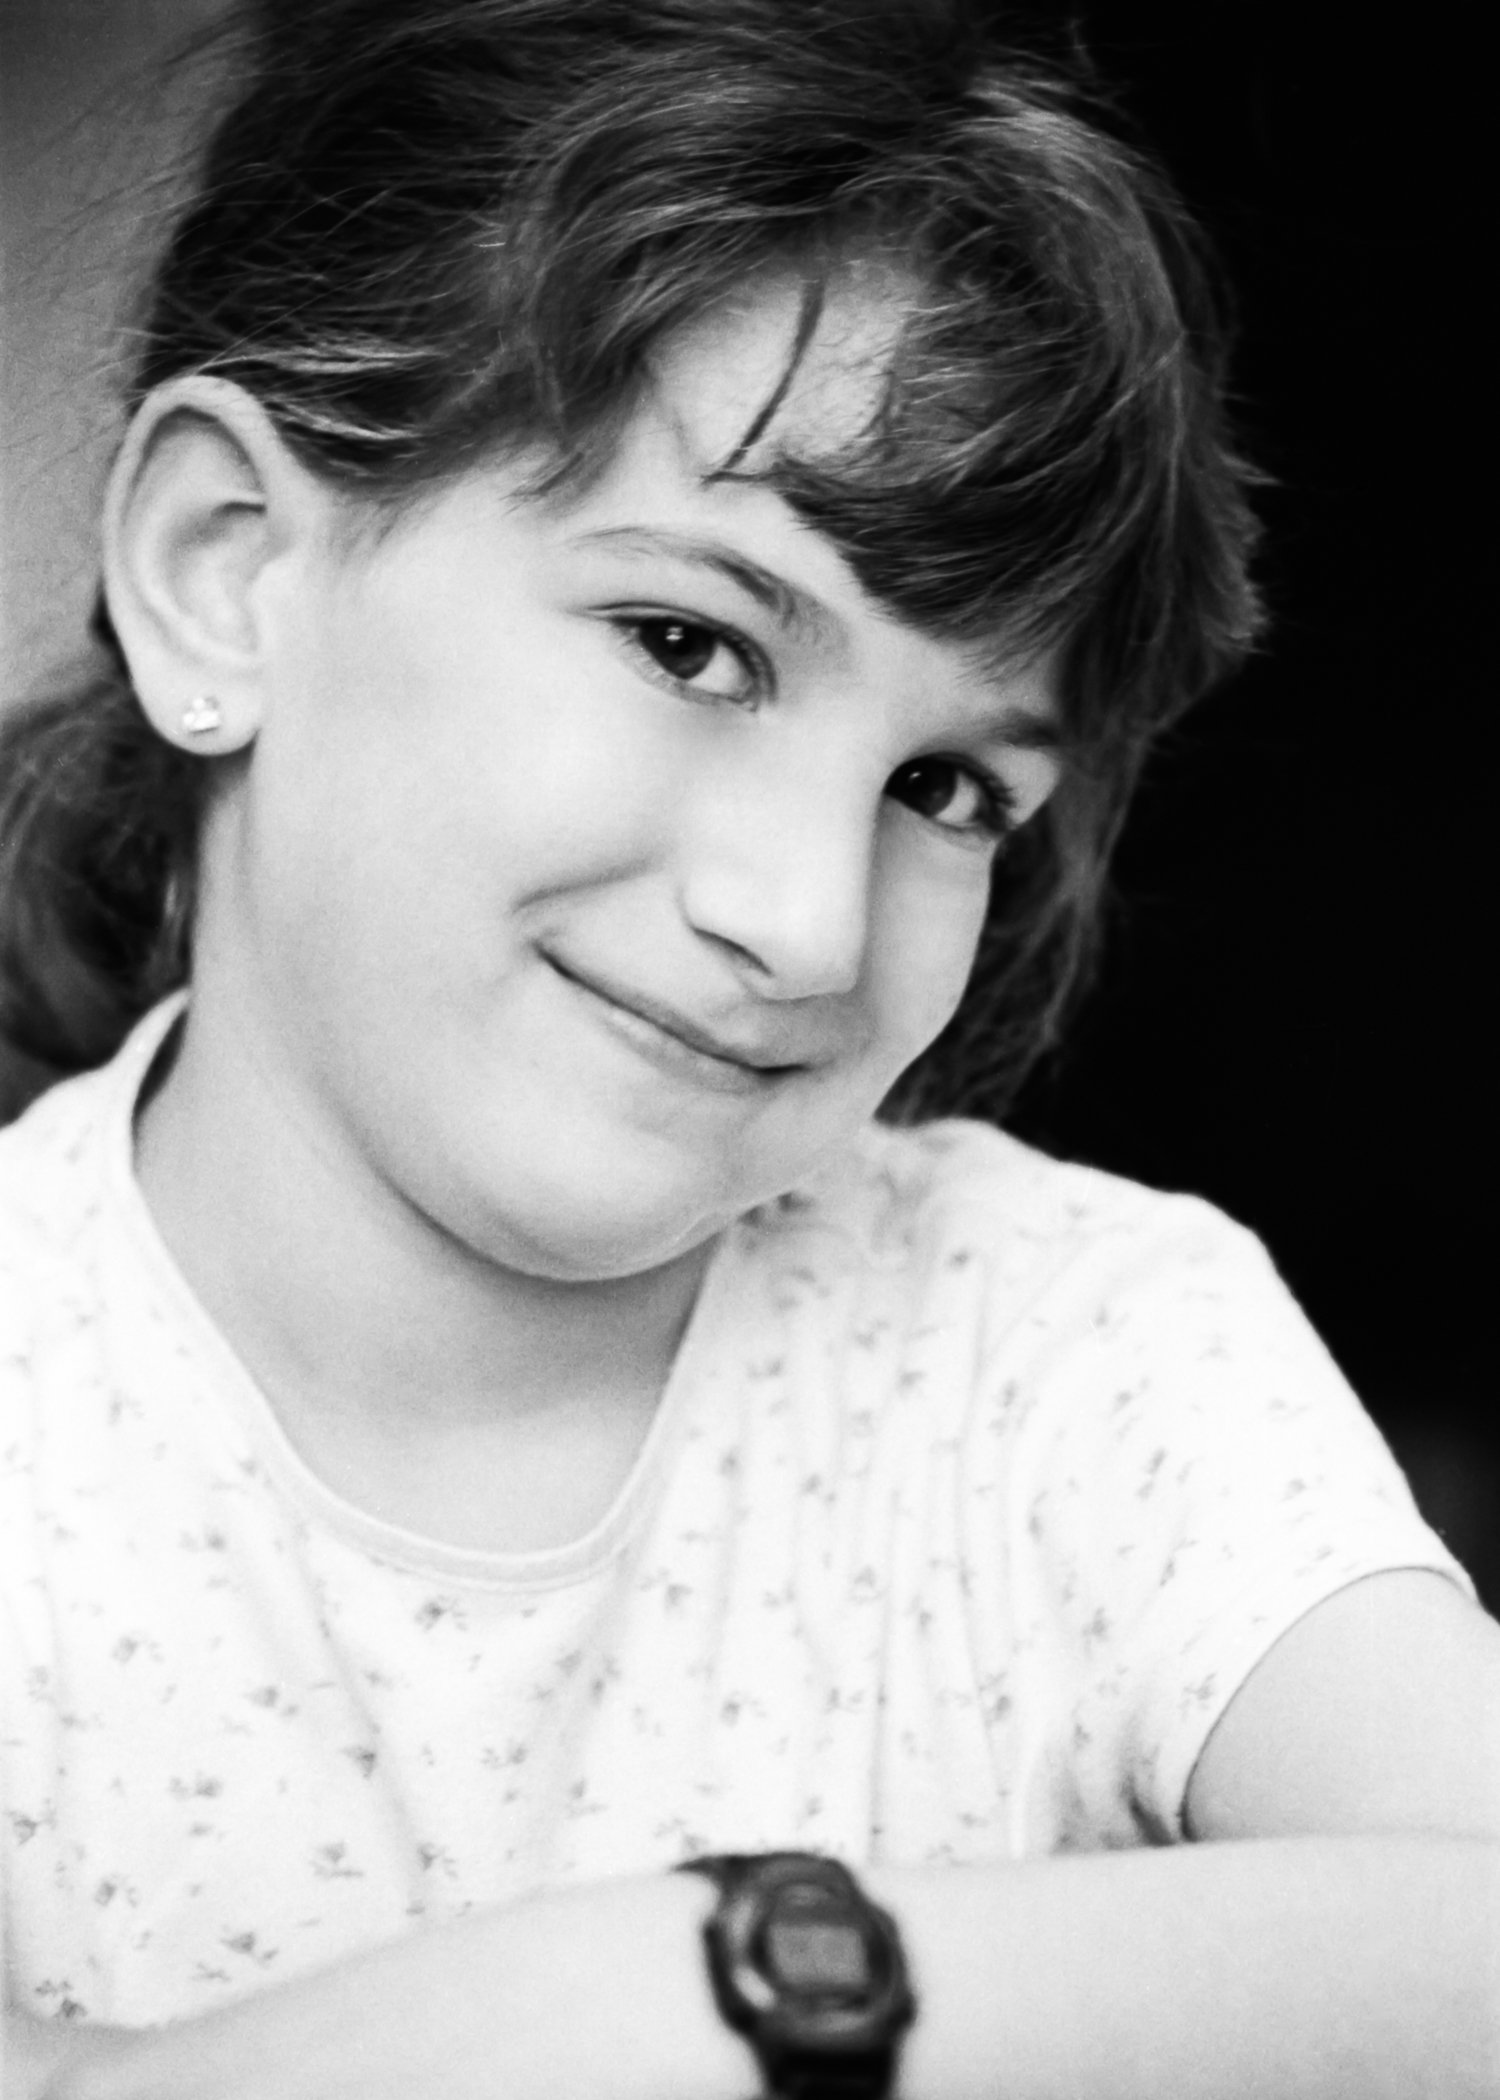 Diana '98